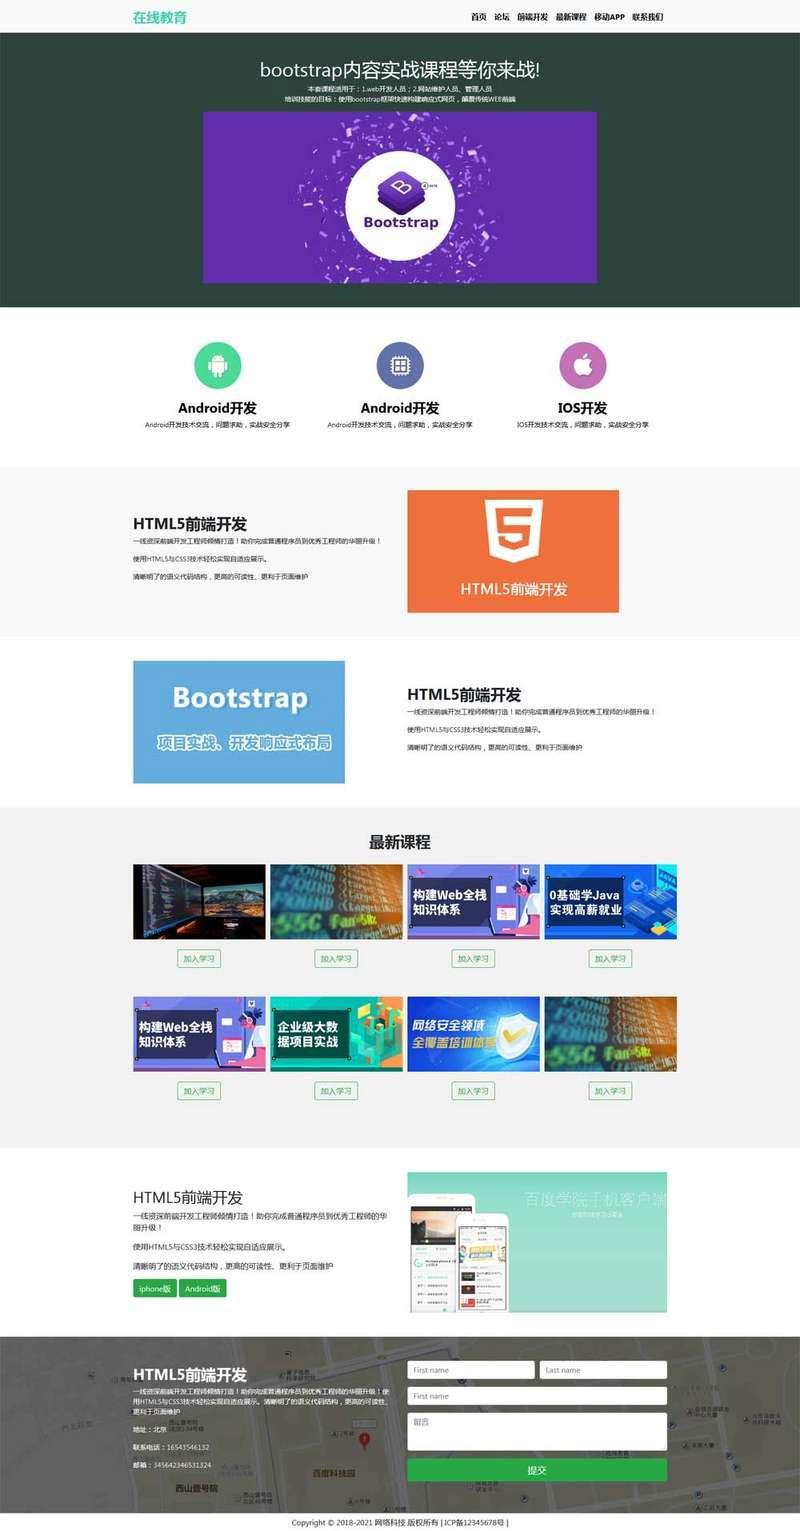 bootstrap响应式在线教育课程学习平台首页模板